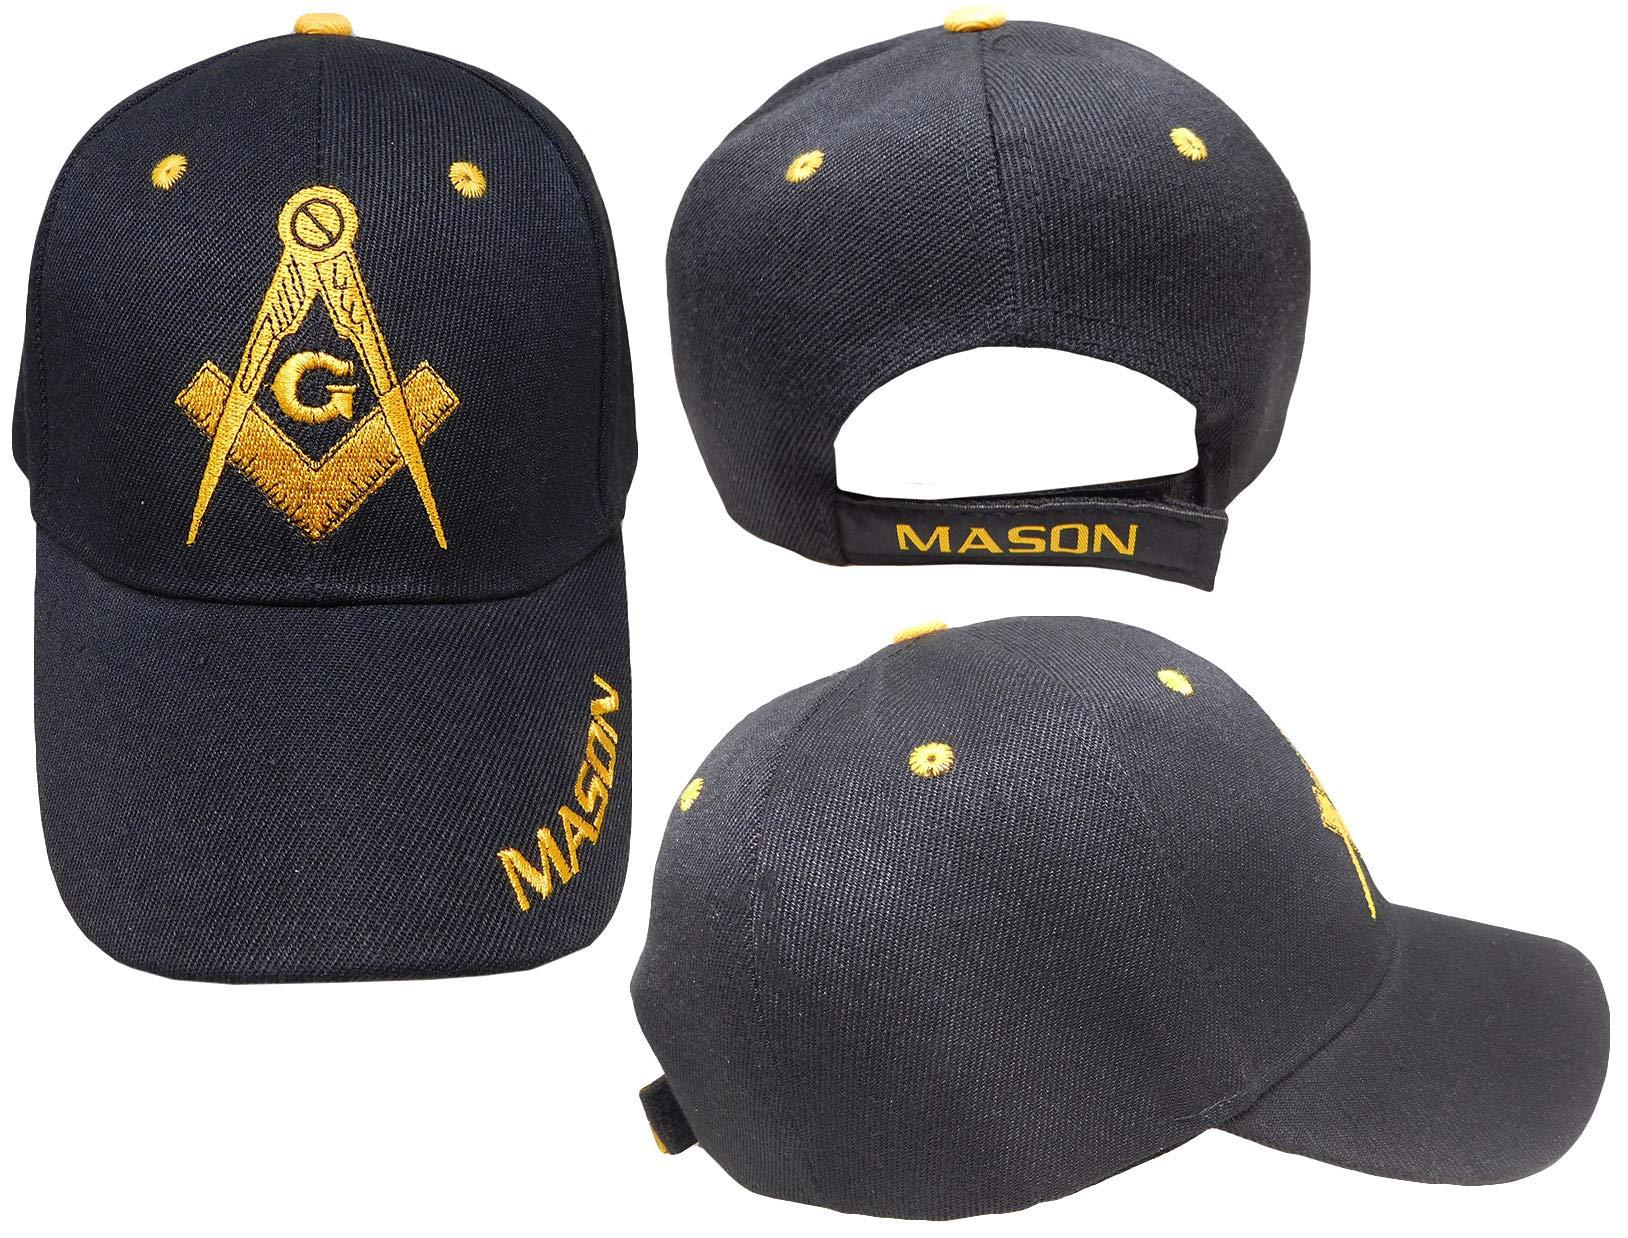 Freemason Embroidered Black Adjustable Hat Mason Masonic Lodge Baseball Cap